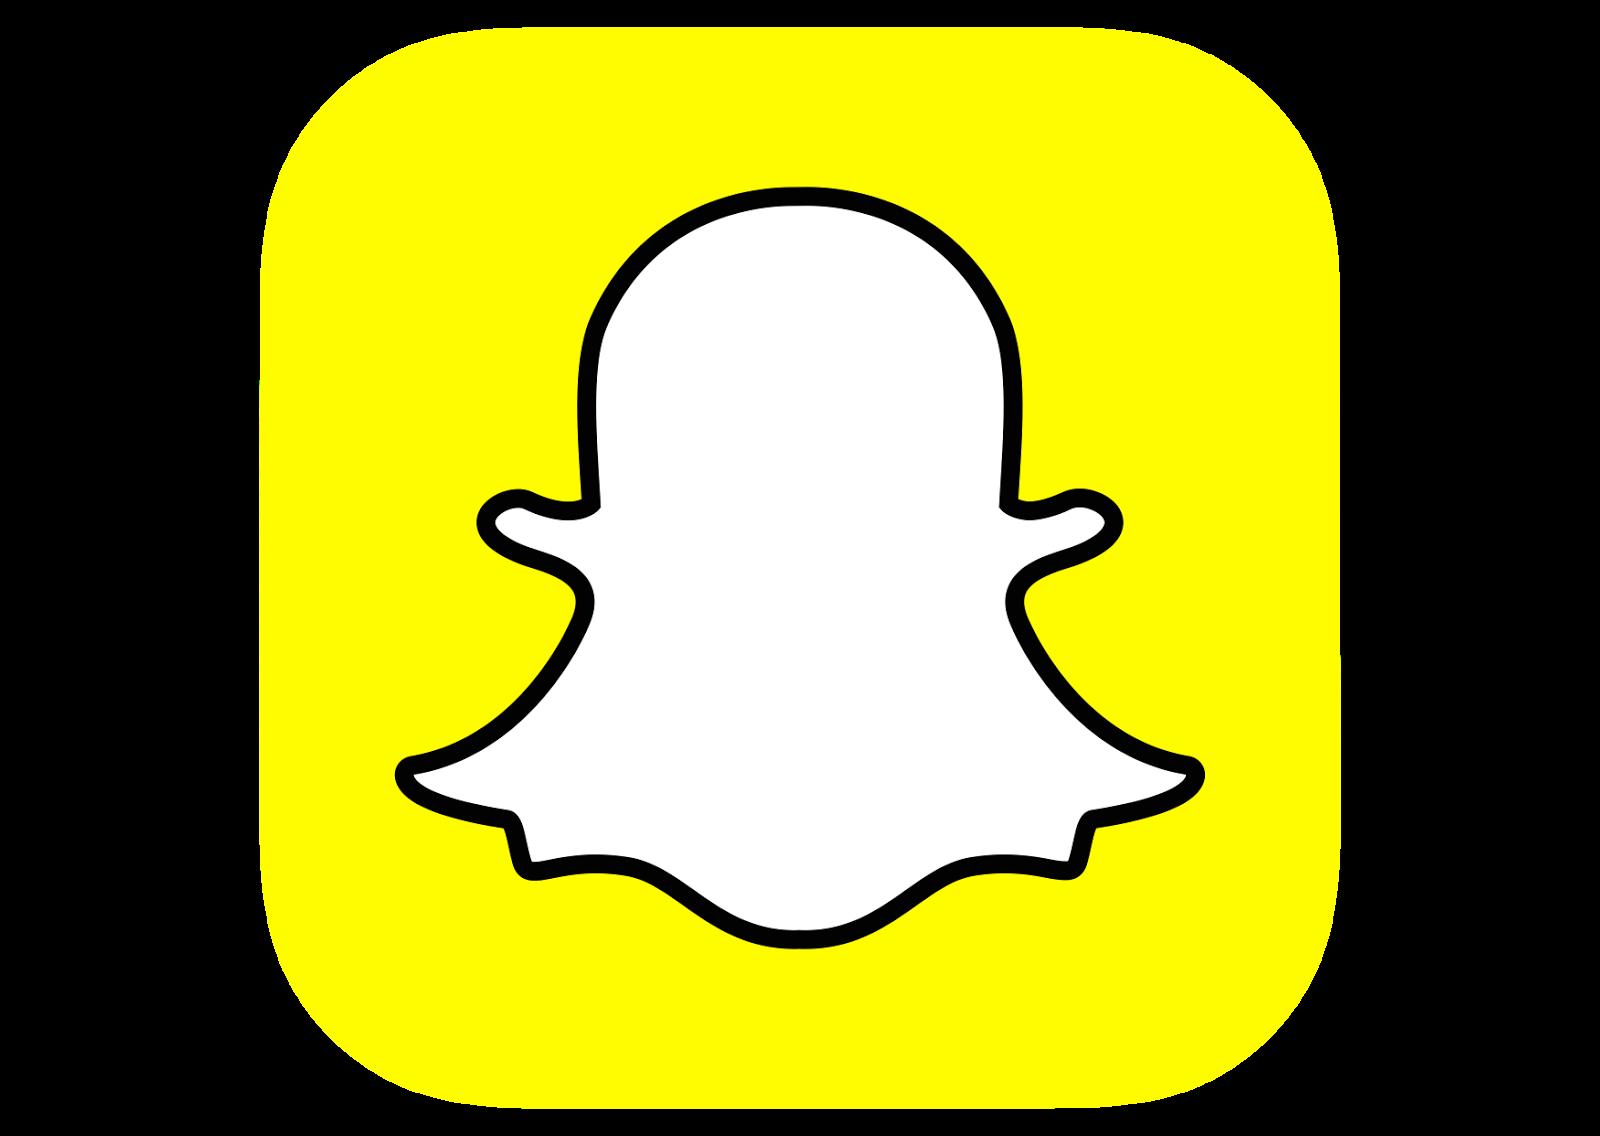 snapchat-logo-vector-download-free-icon-0.png